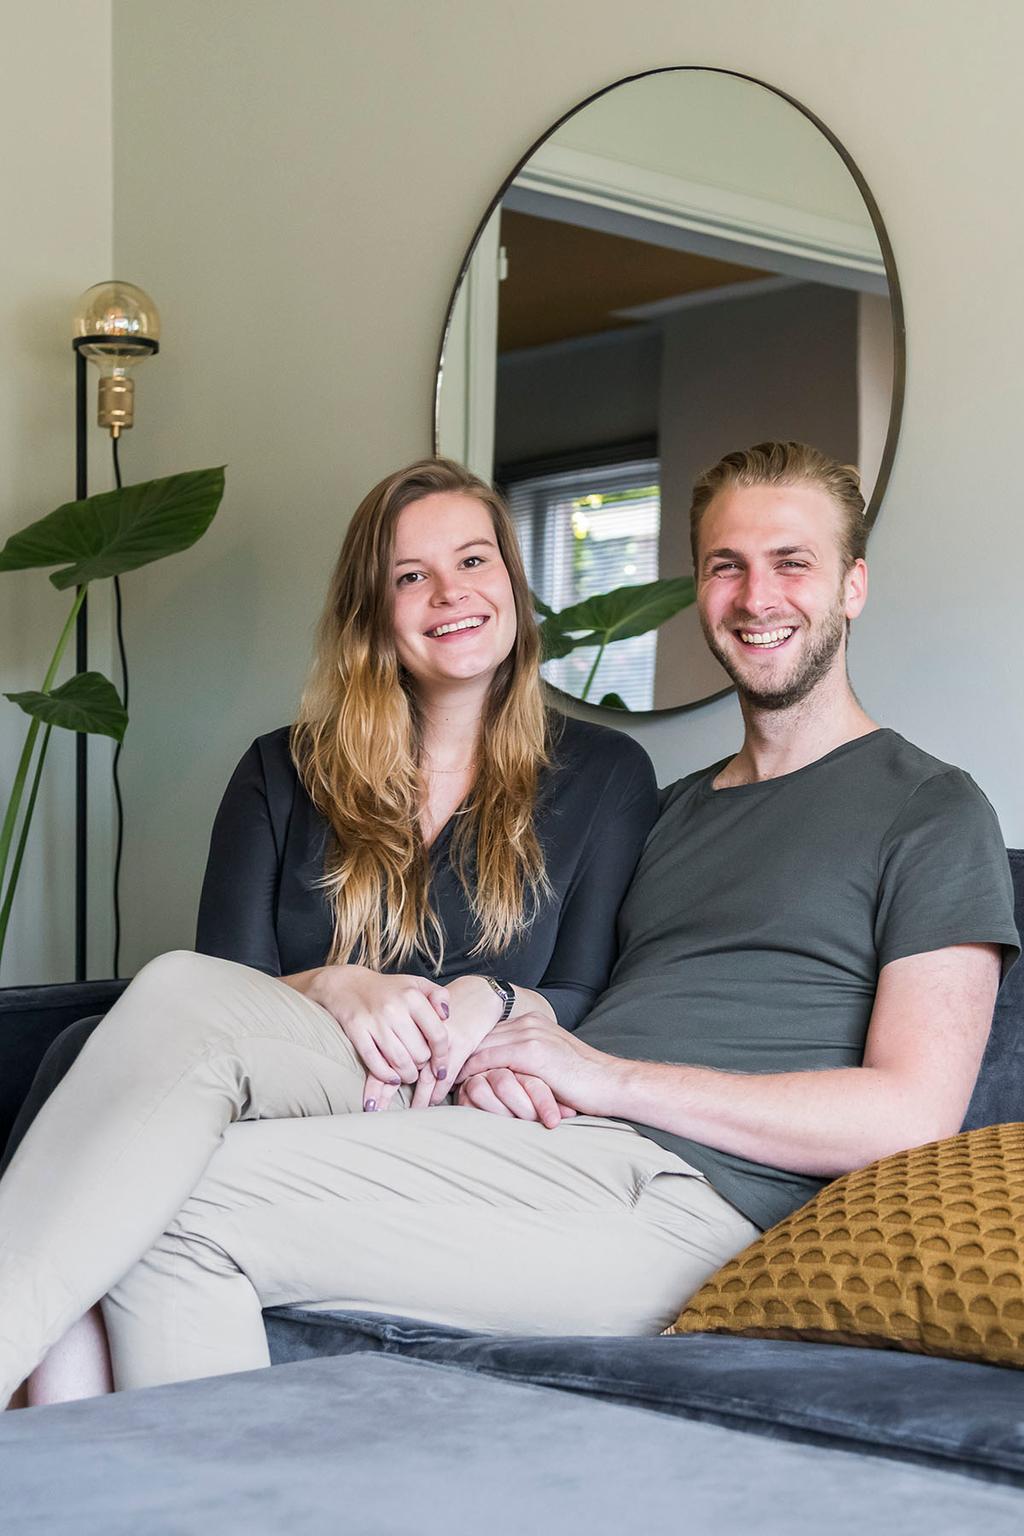 Sarah en Simon / Jonah Samyn / Een frisse start met vtwonen